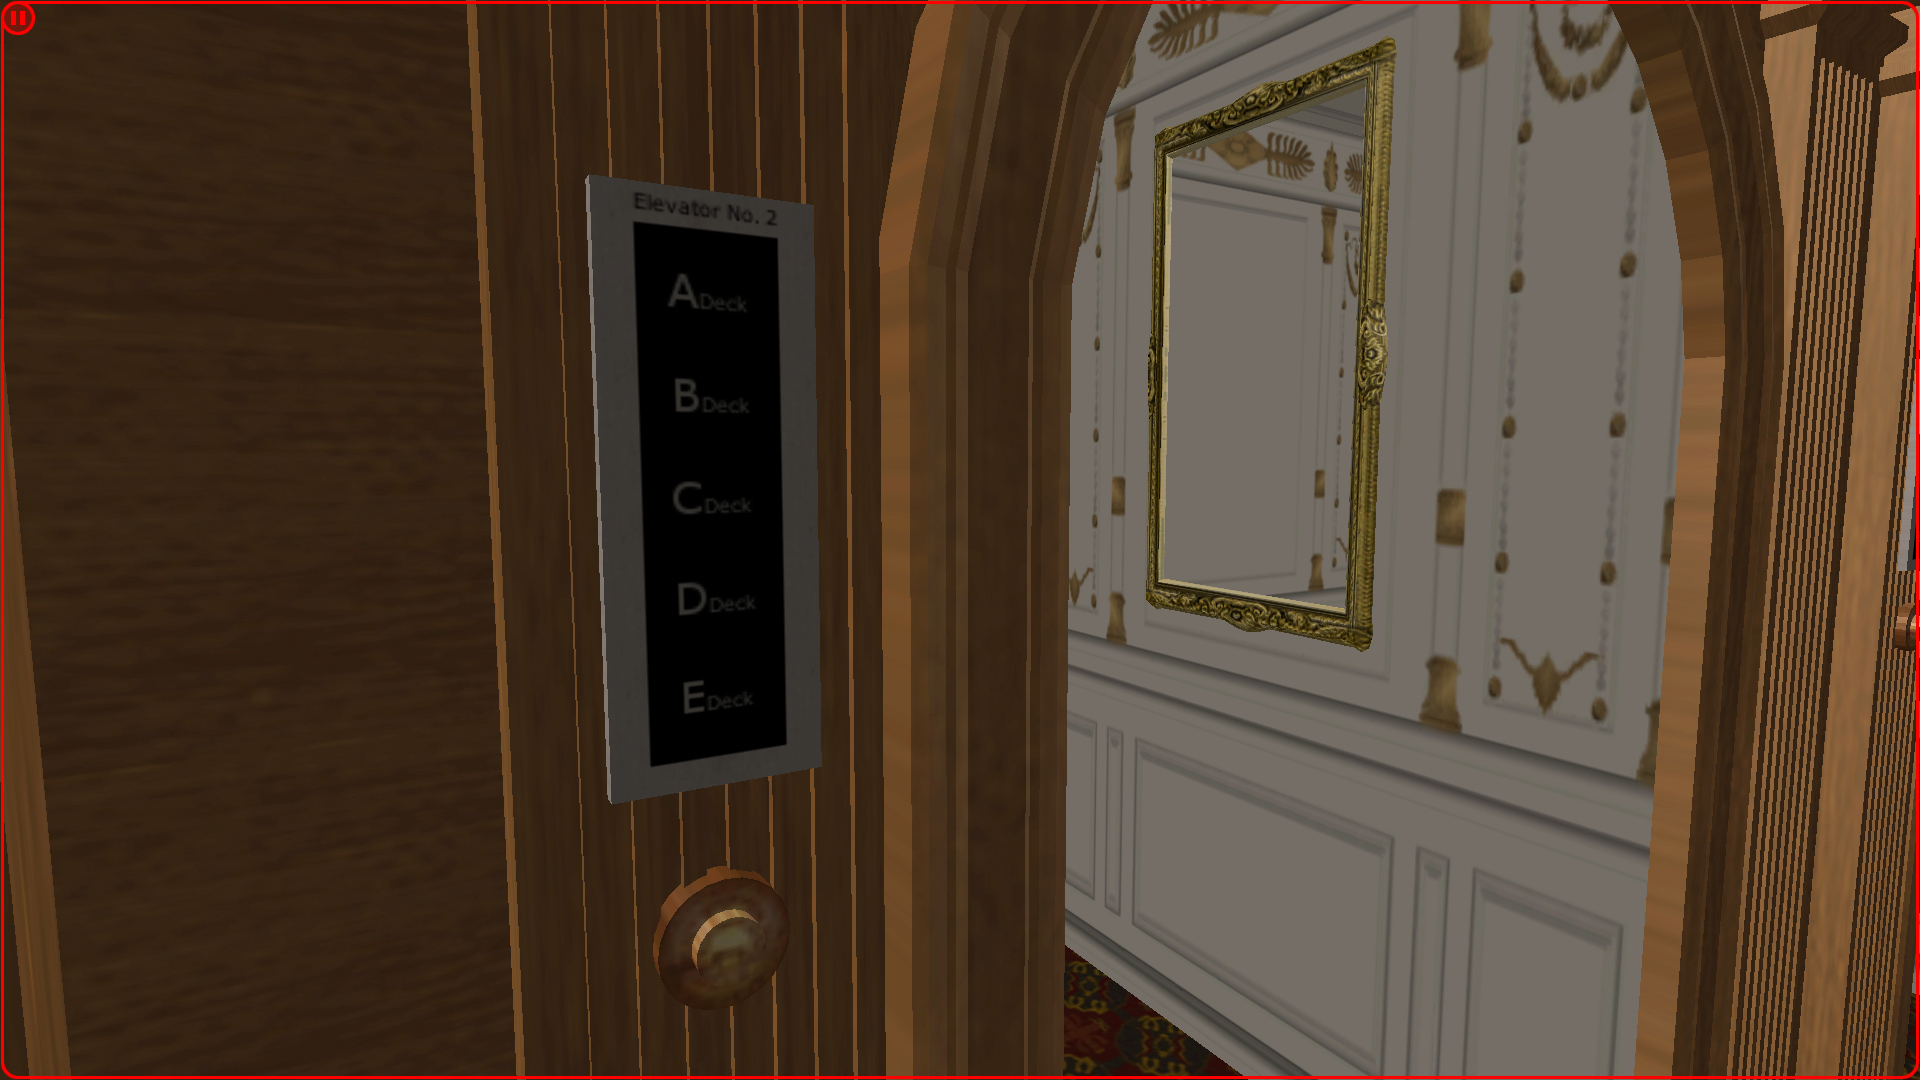 The Sims 2 Titanic Sims2e64